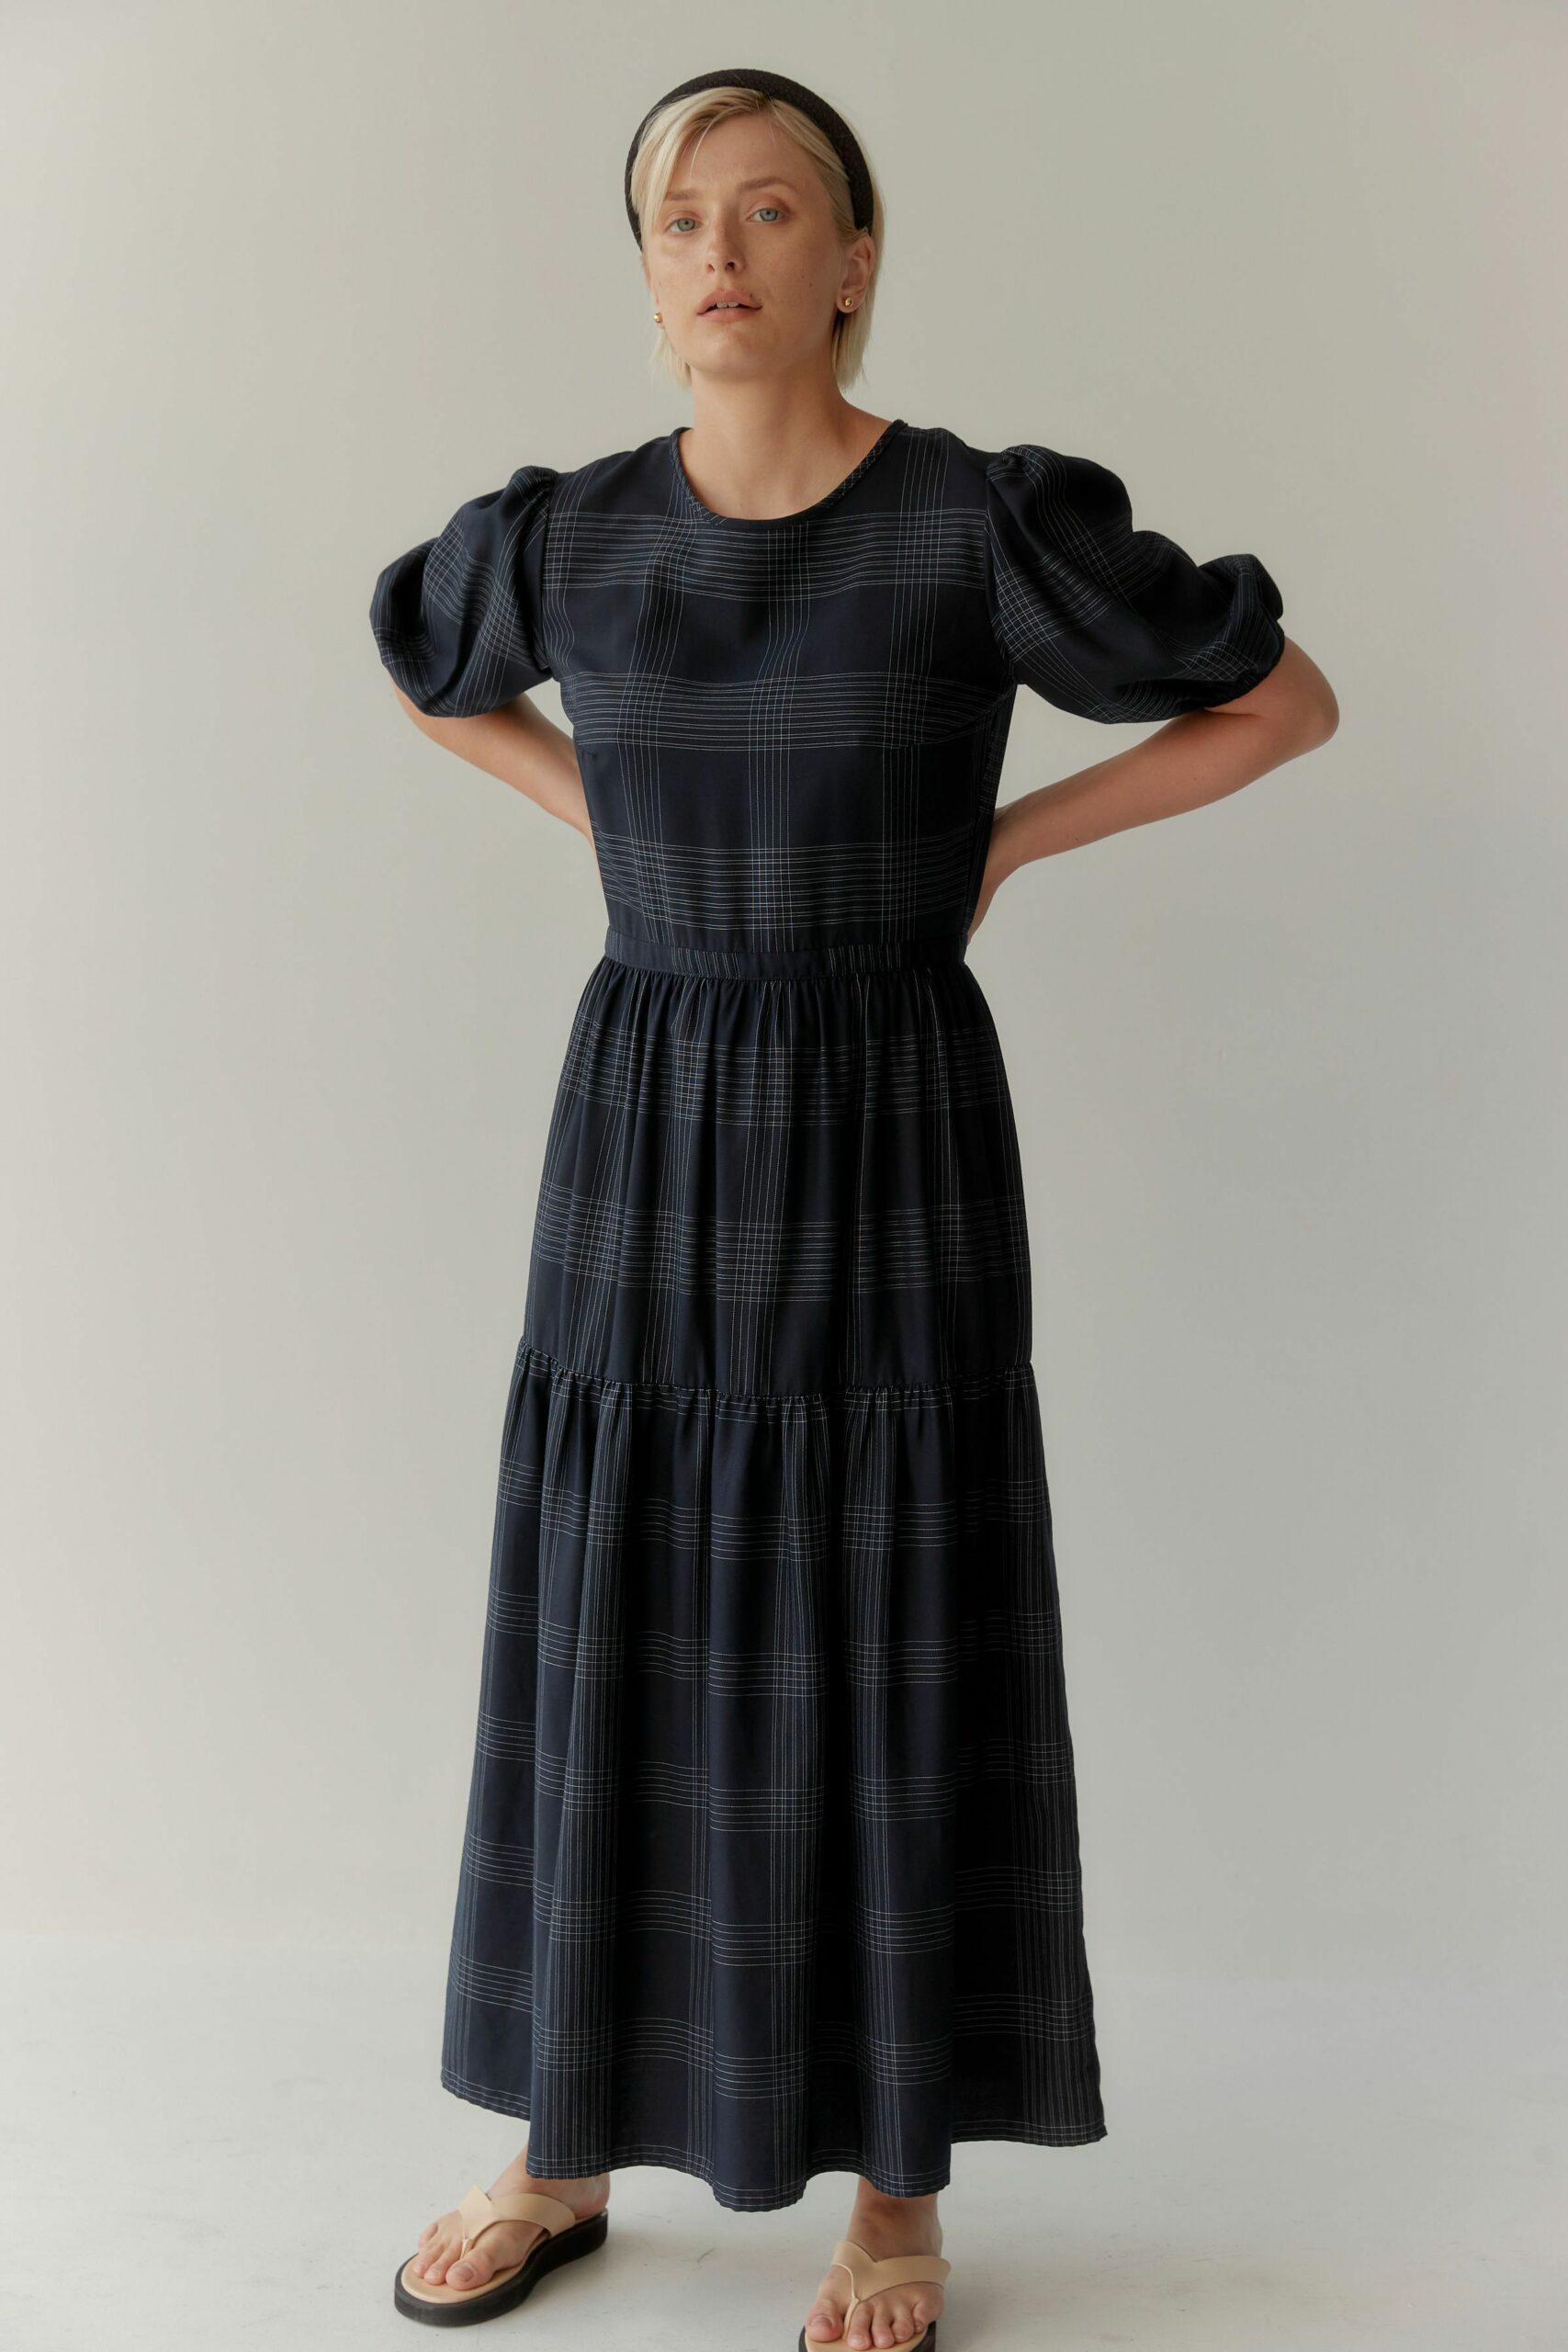 Pilot Client Digital Mina_model wears dress in Auckland studio.